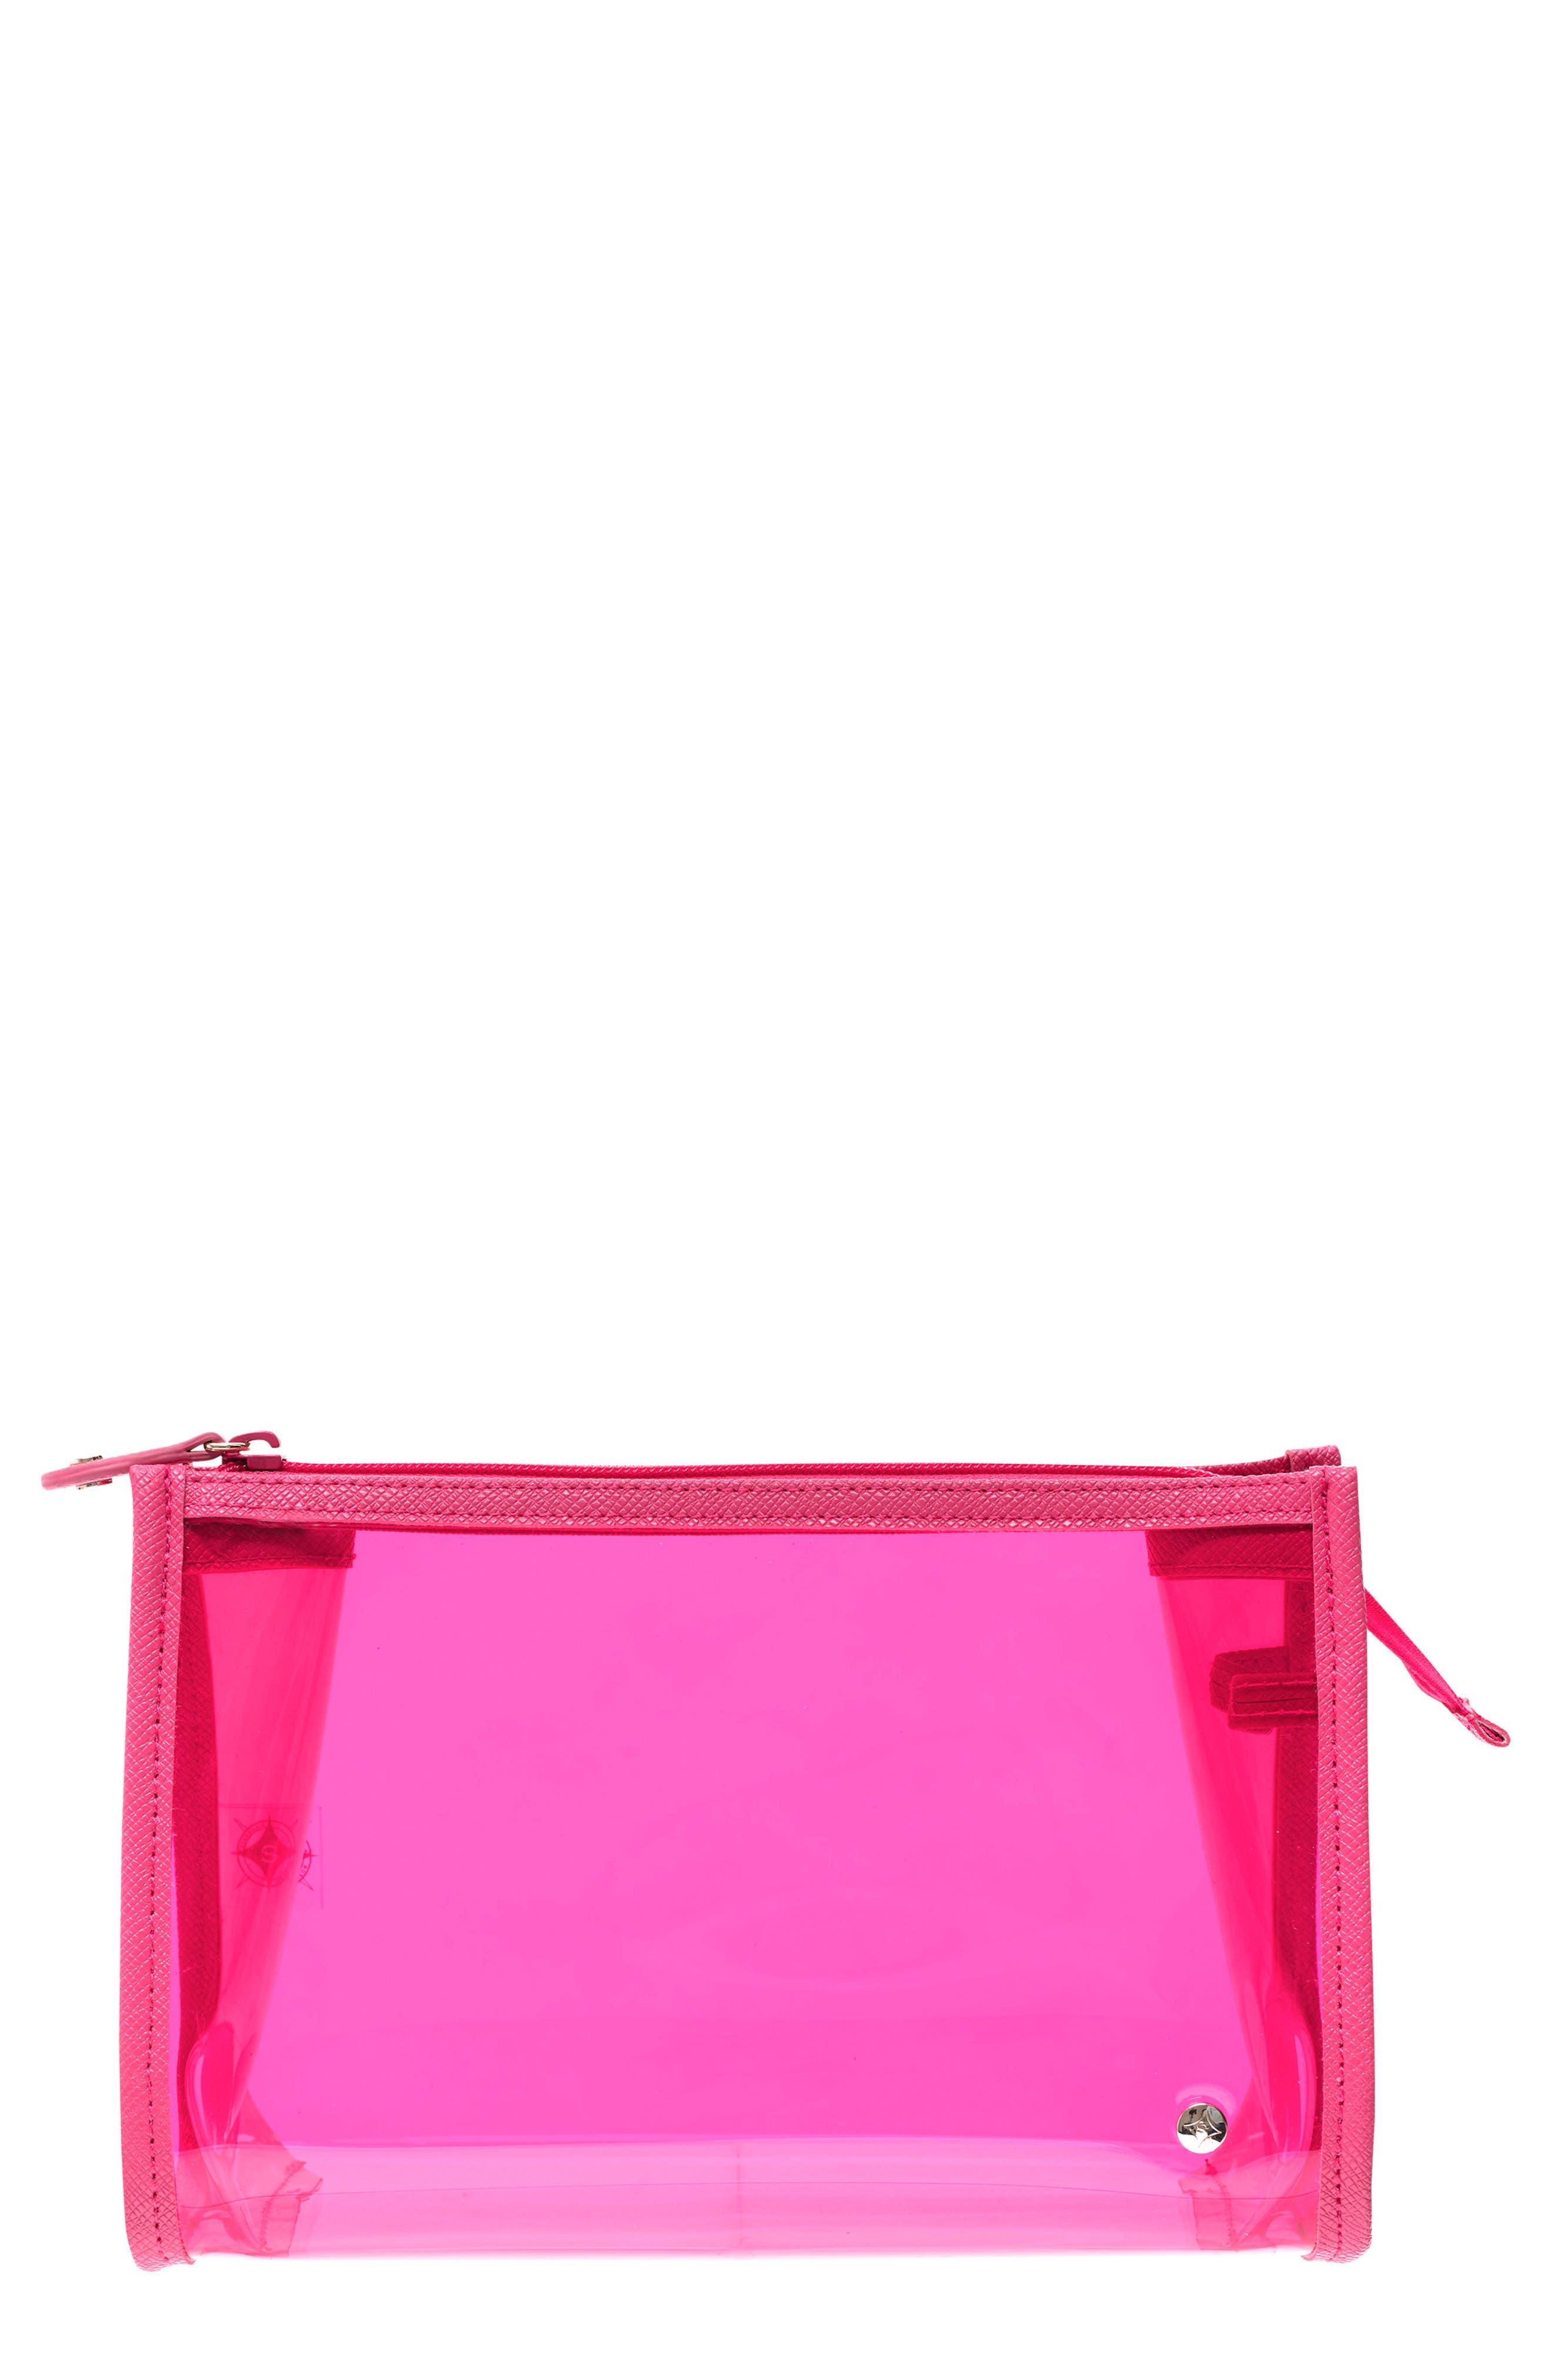 Main Image - Stephanie Johnson Miami Medium Zip Closure Cosmetics Case